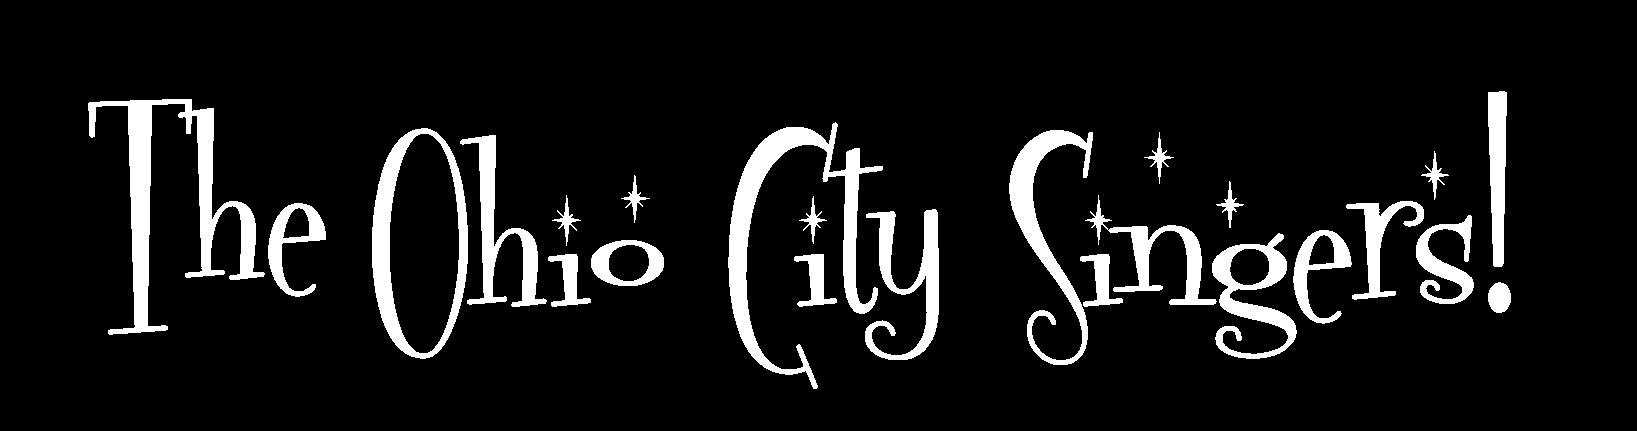 Full logo white transparent.png